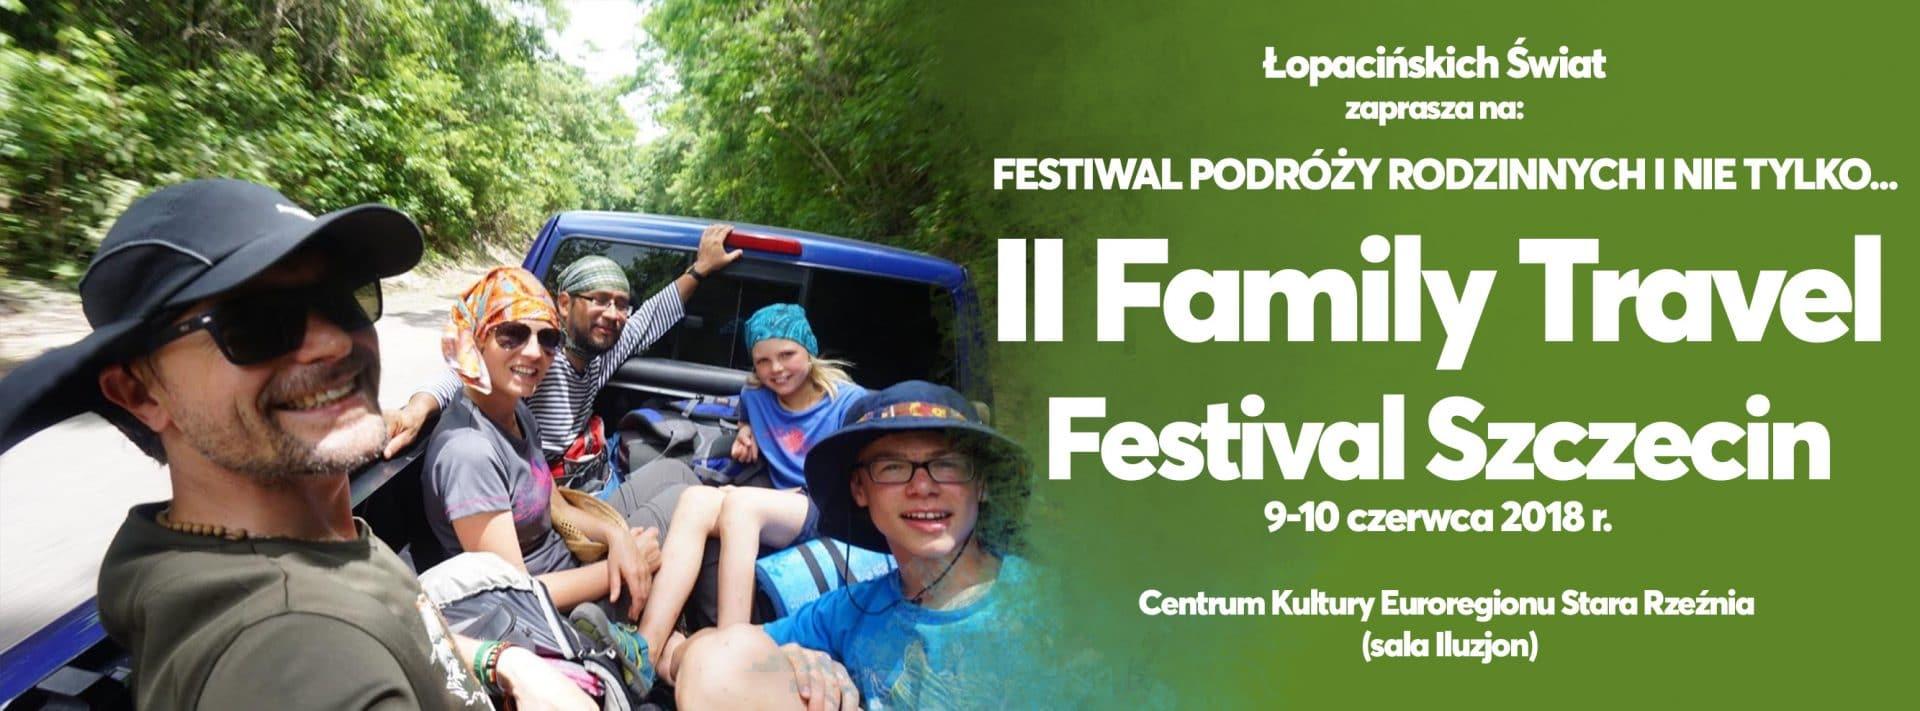 II Family Travel Festival Szczecin